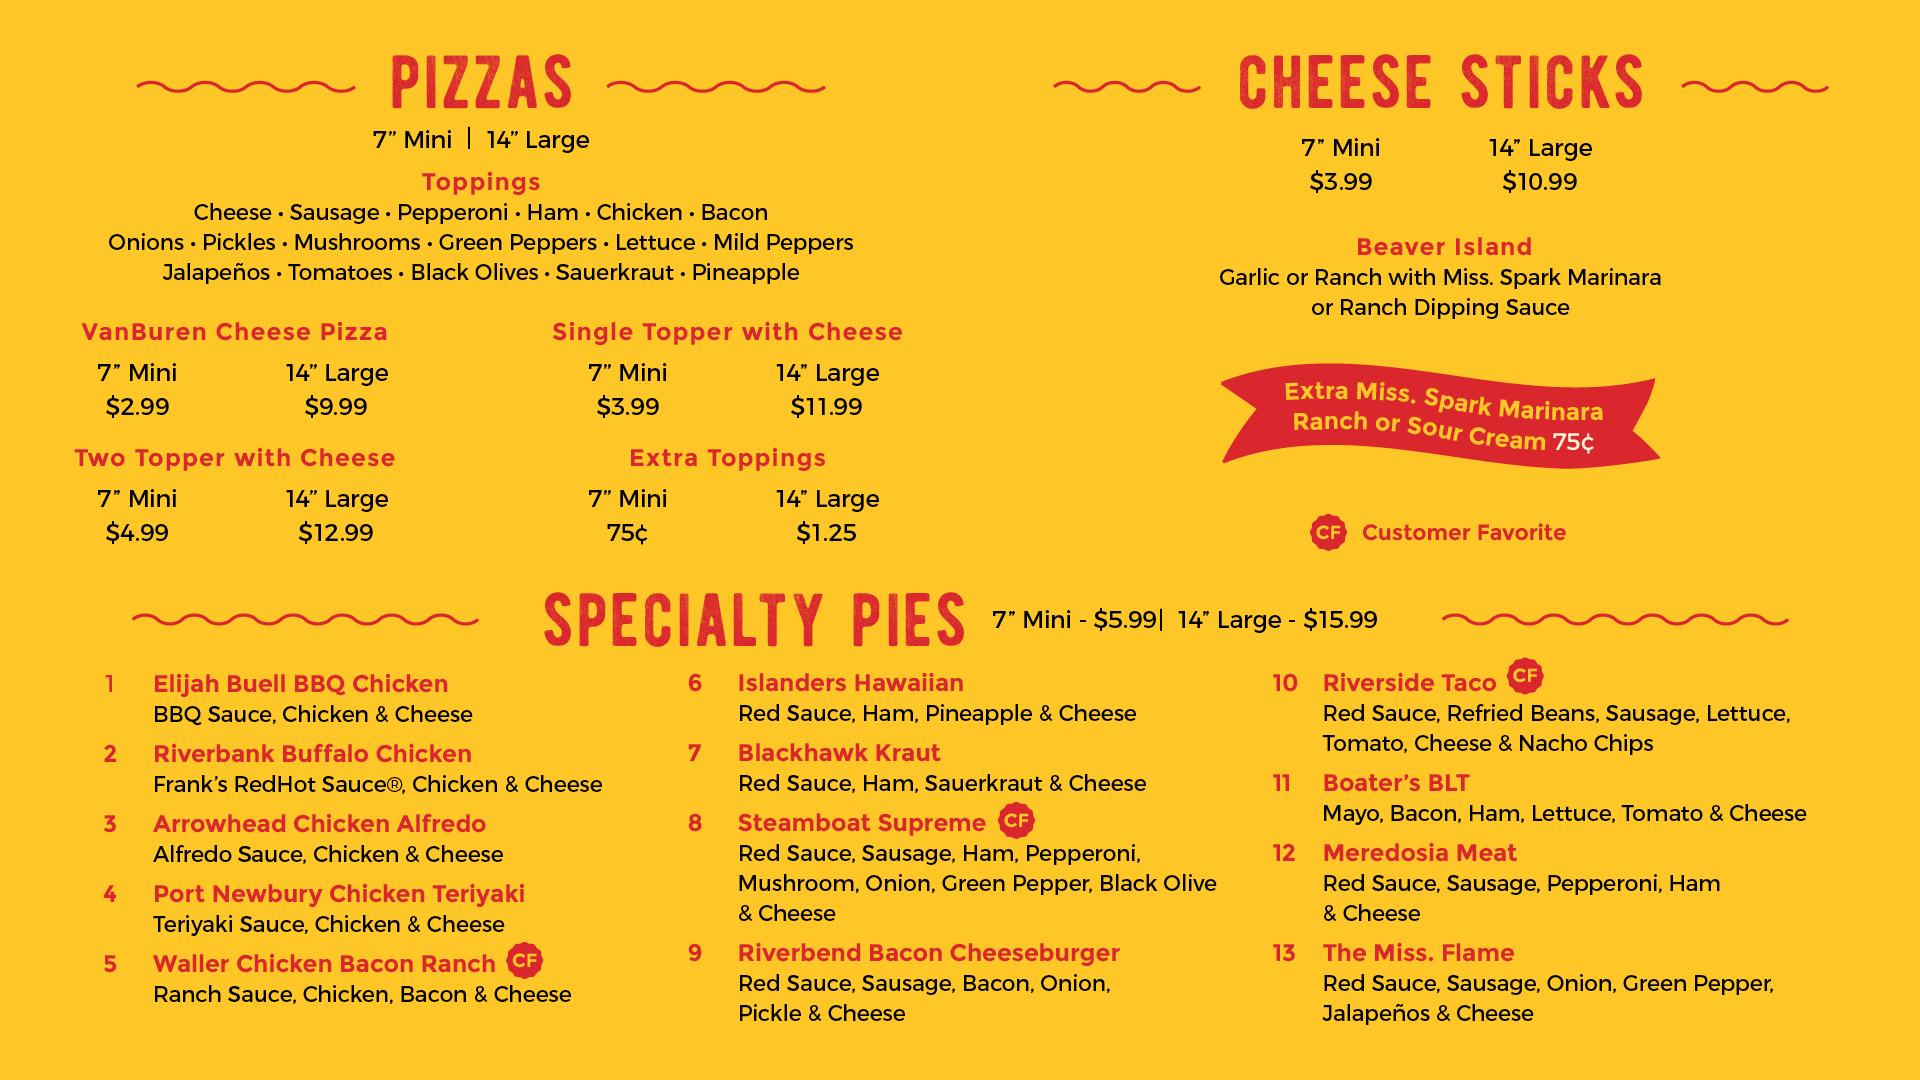 18-Subs2Go-DigitalMenuboards-Pizzas&Cheesesticks.jpg